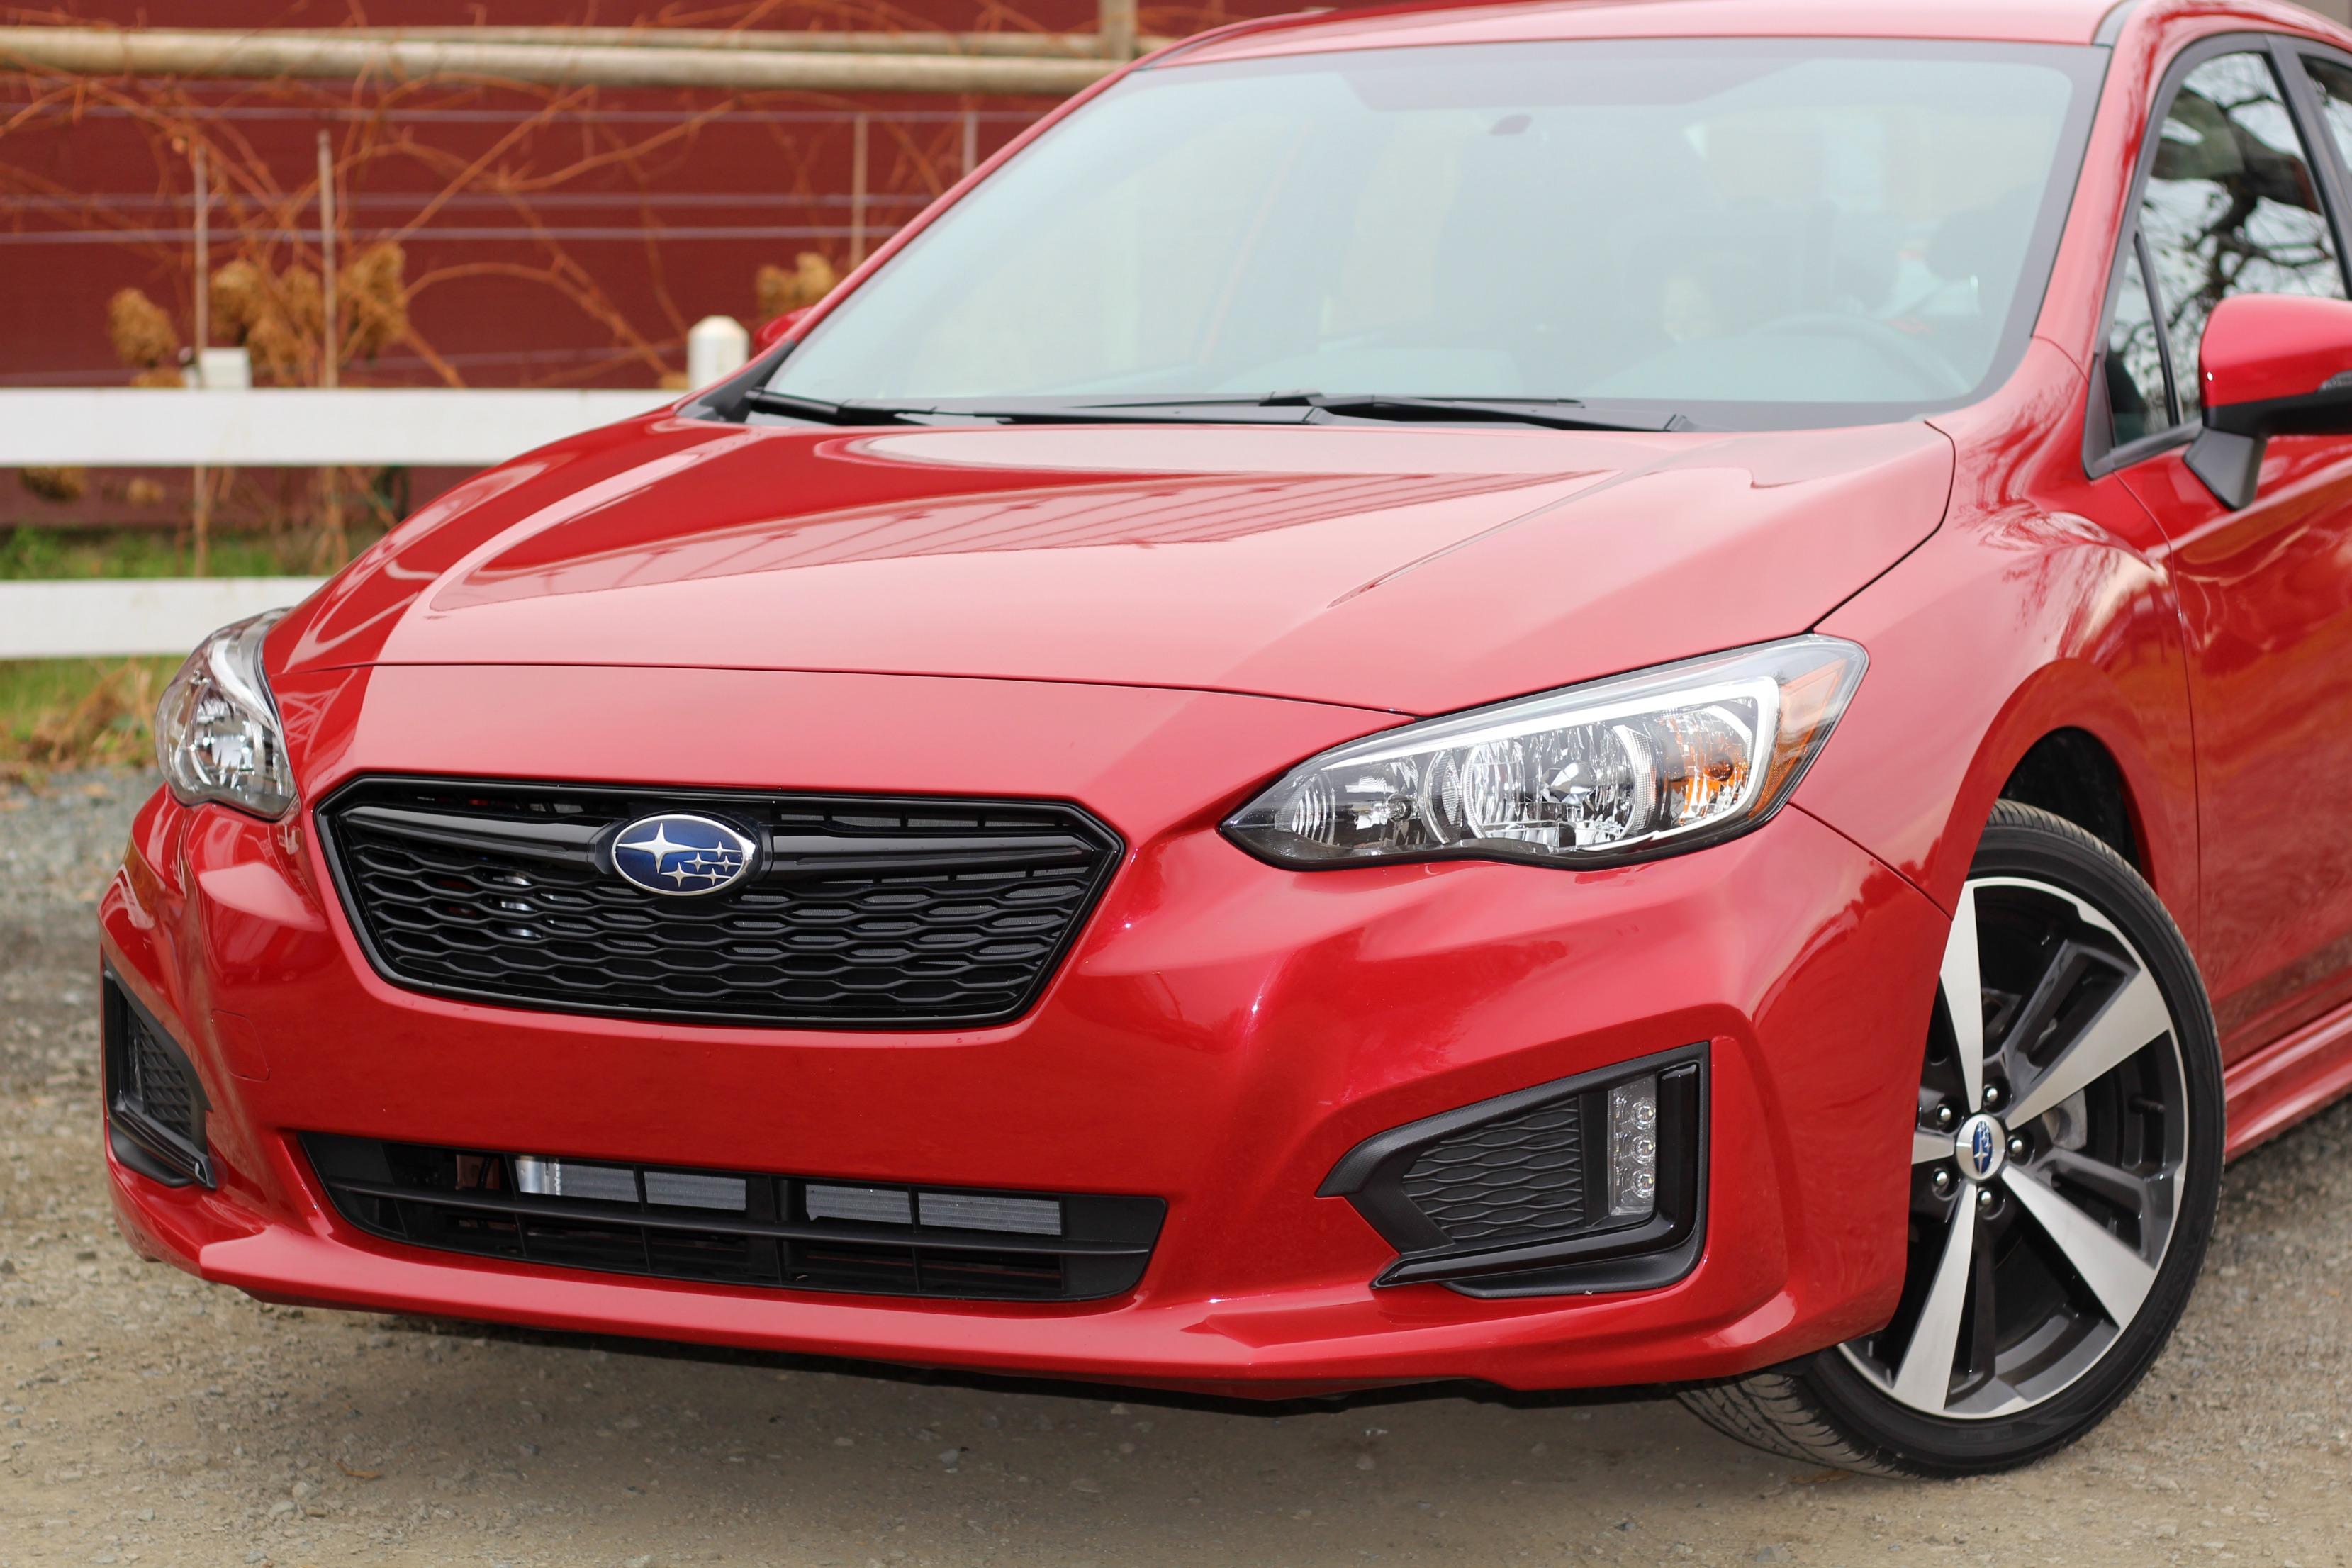 Red 2017 Subaru Impreza compact AWD sedan